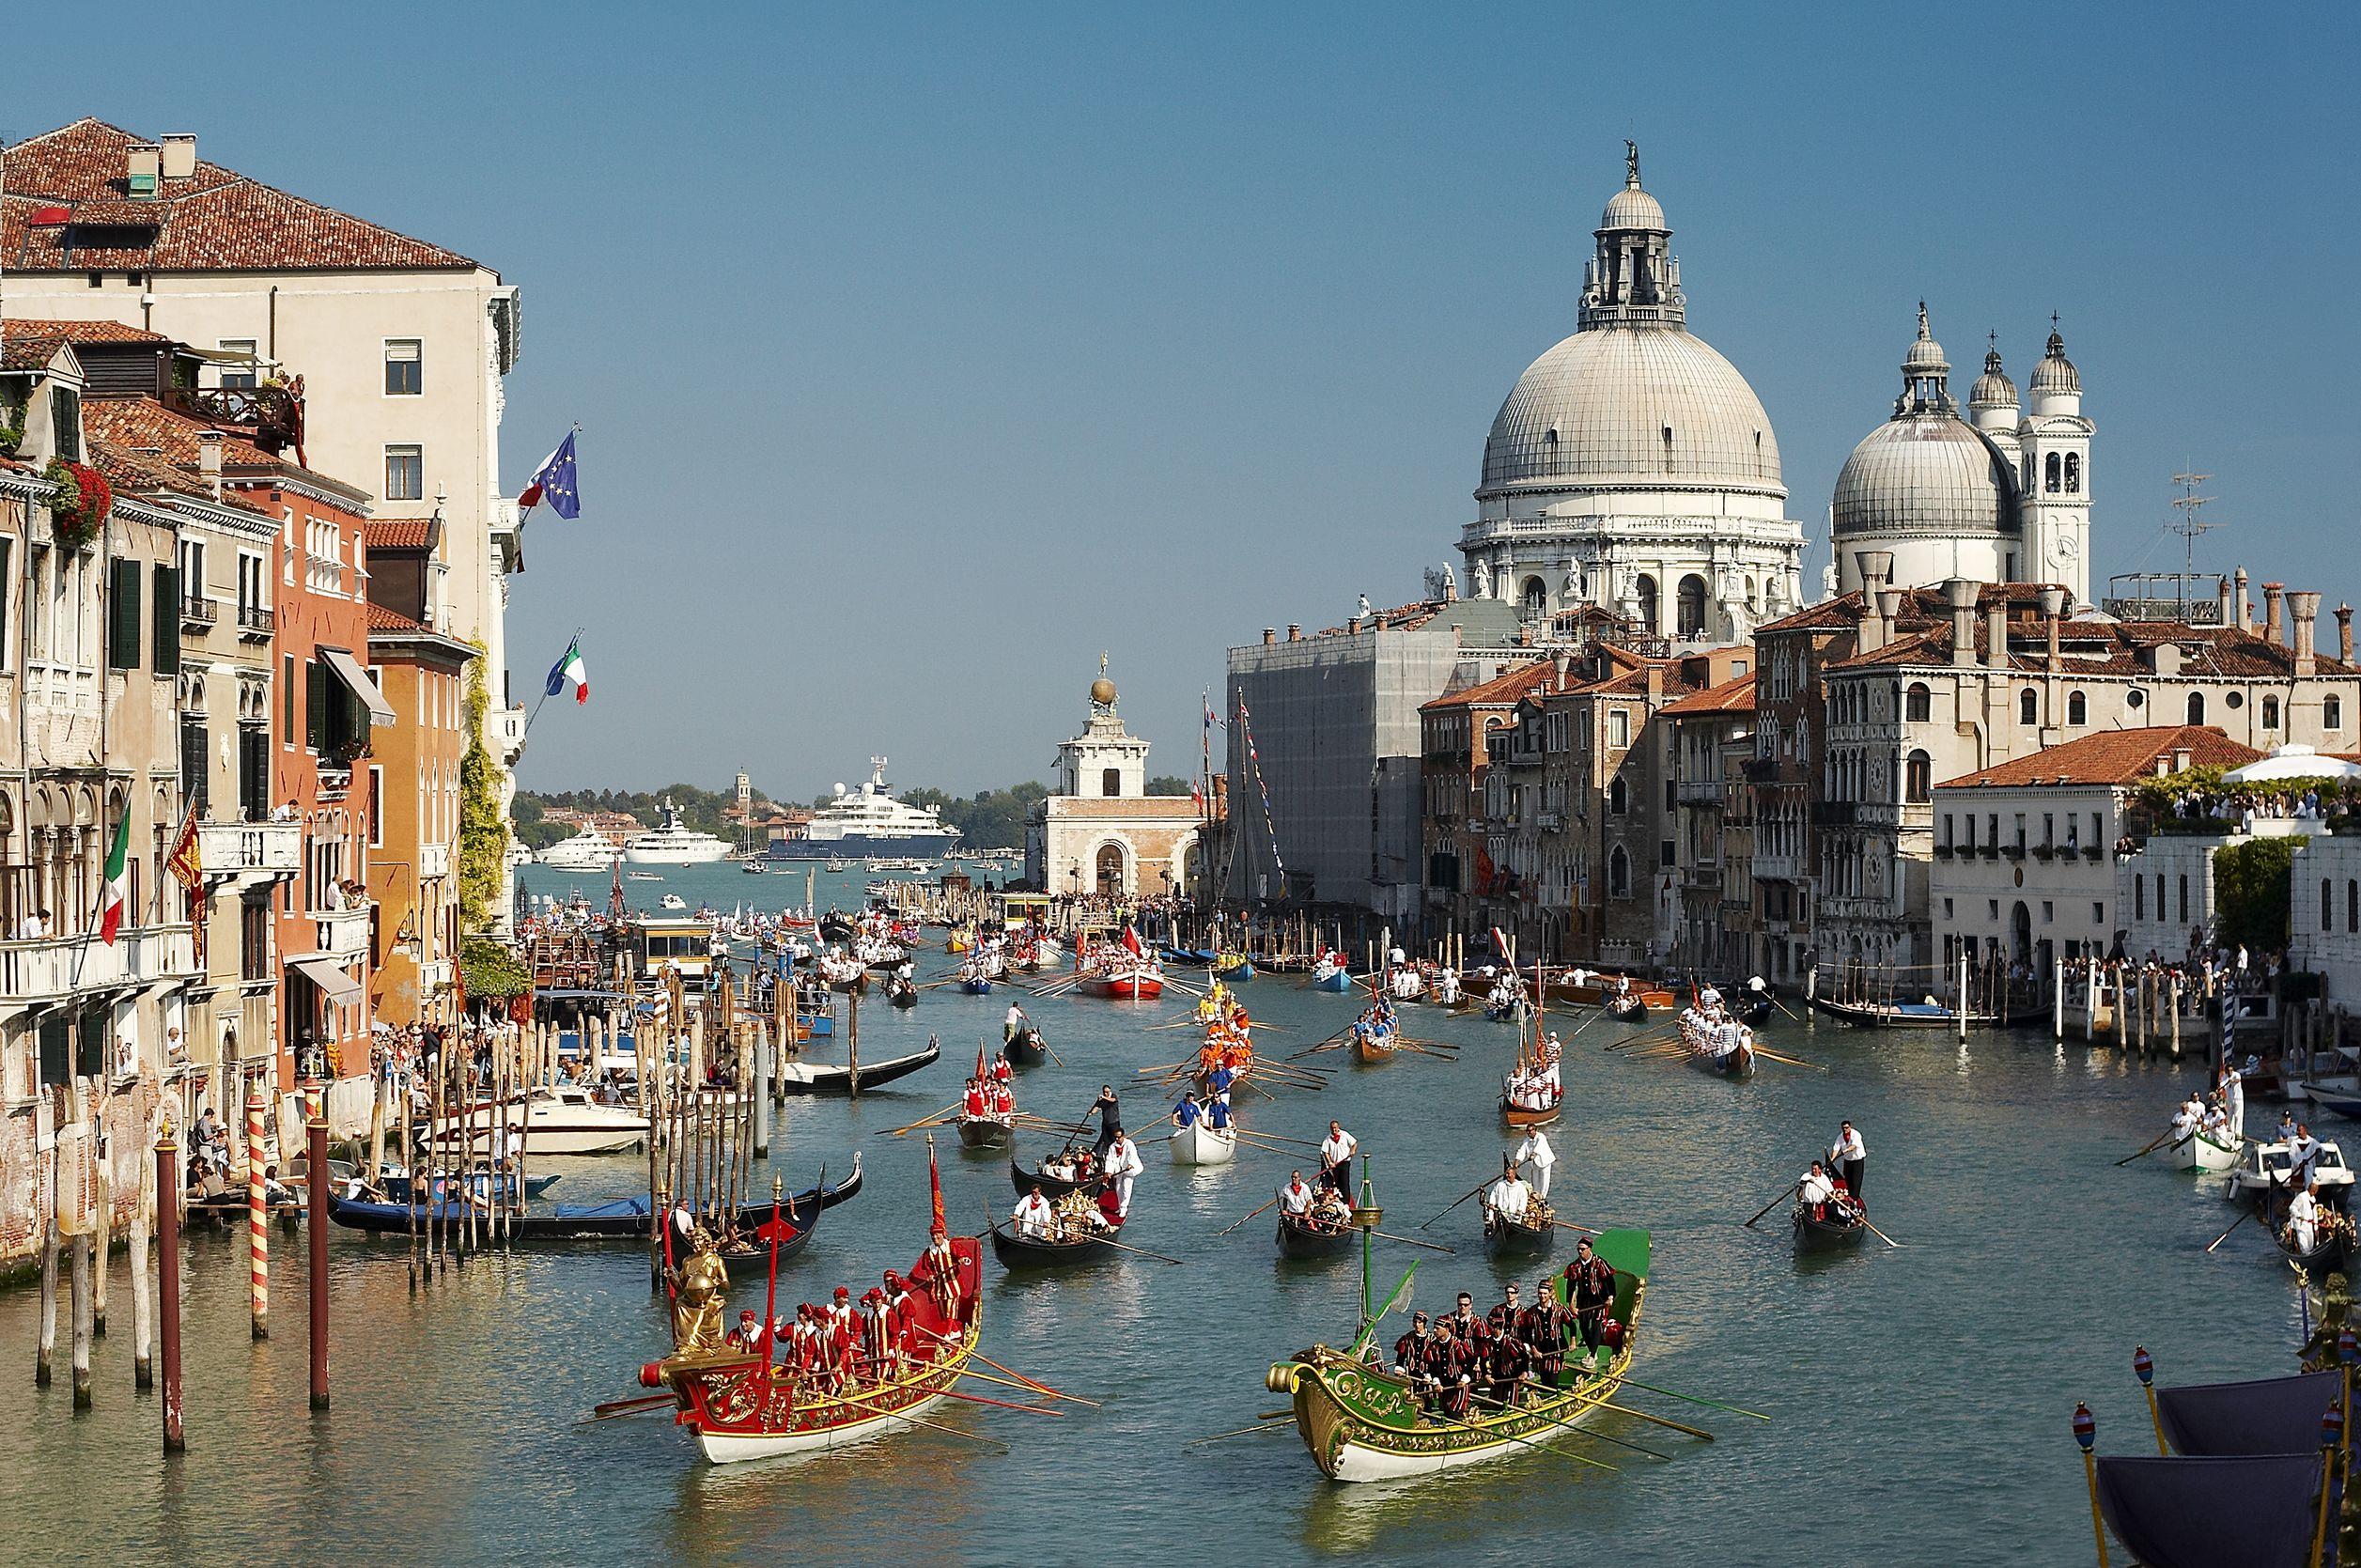 Voga Alla Veneta & Regata Storica – Venice, Italy : World Festival ...